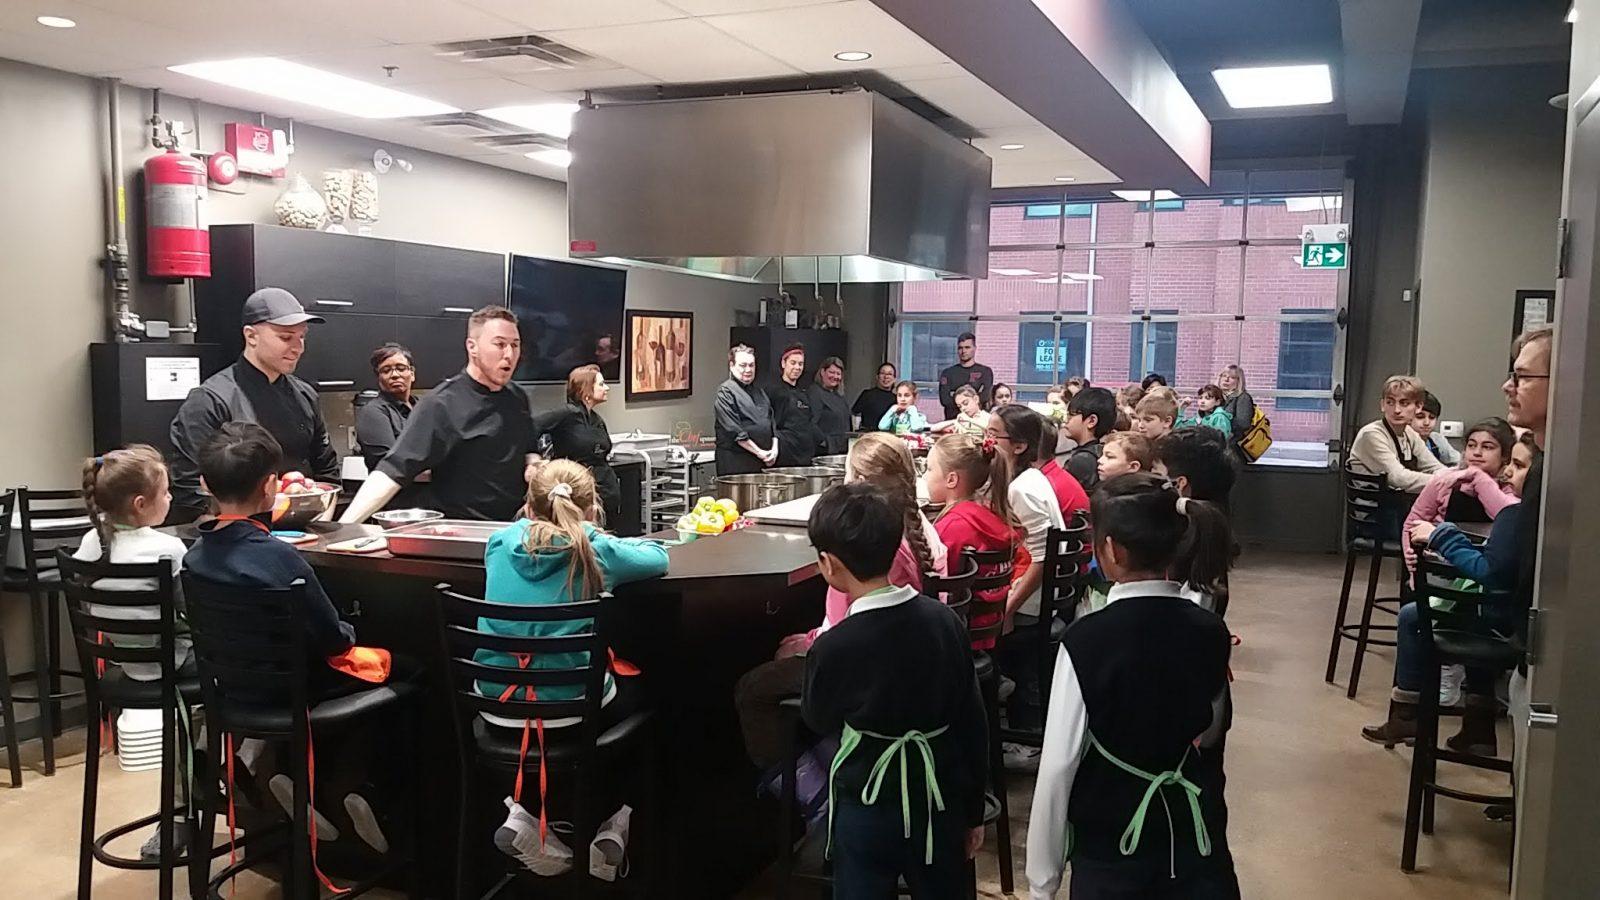 2019 - The Chef Upstairs (Grade 3-8) | The Prestige School regarding Downey Unified School District Calendar 2020